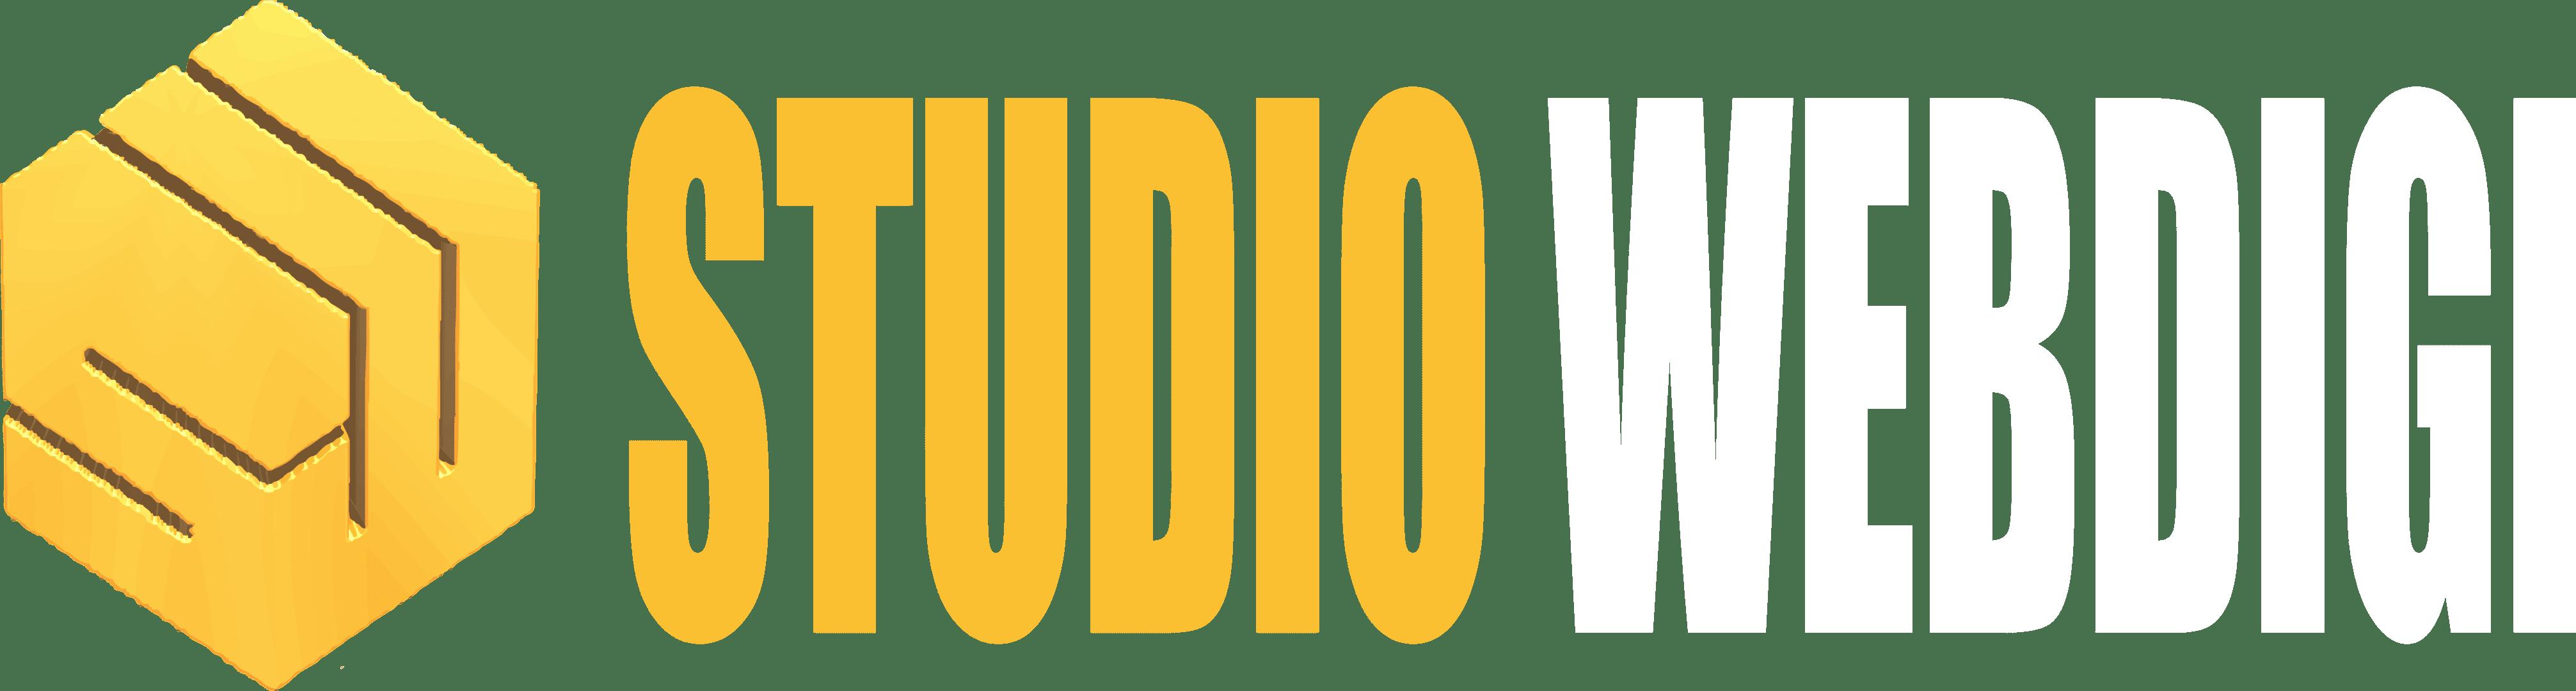 website laten maken - Studio Webdigi